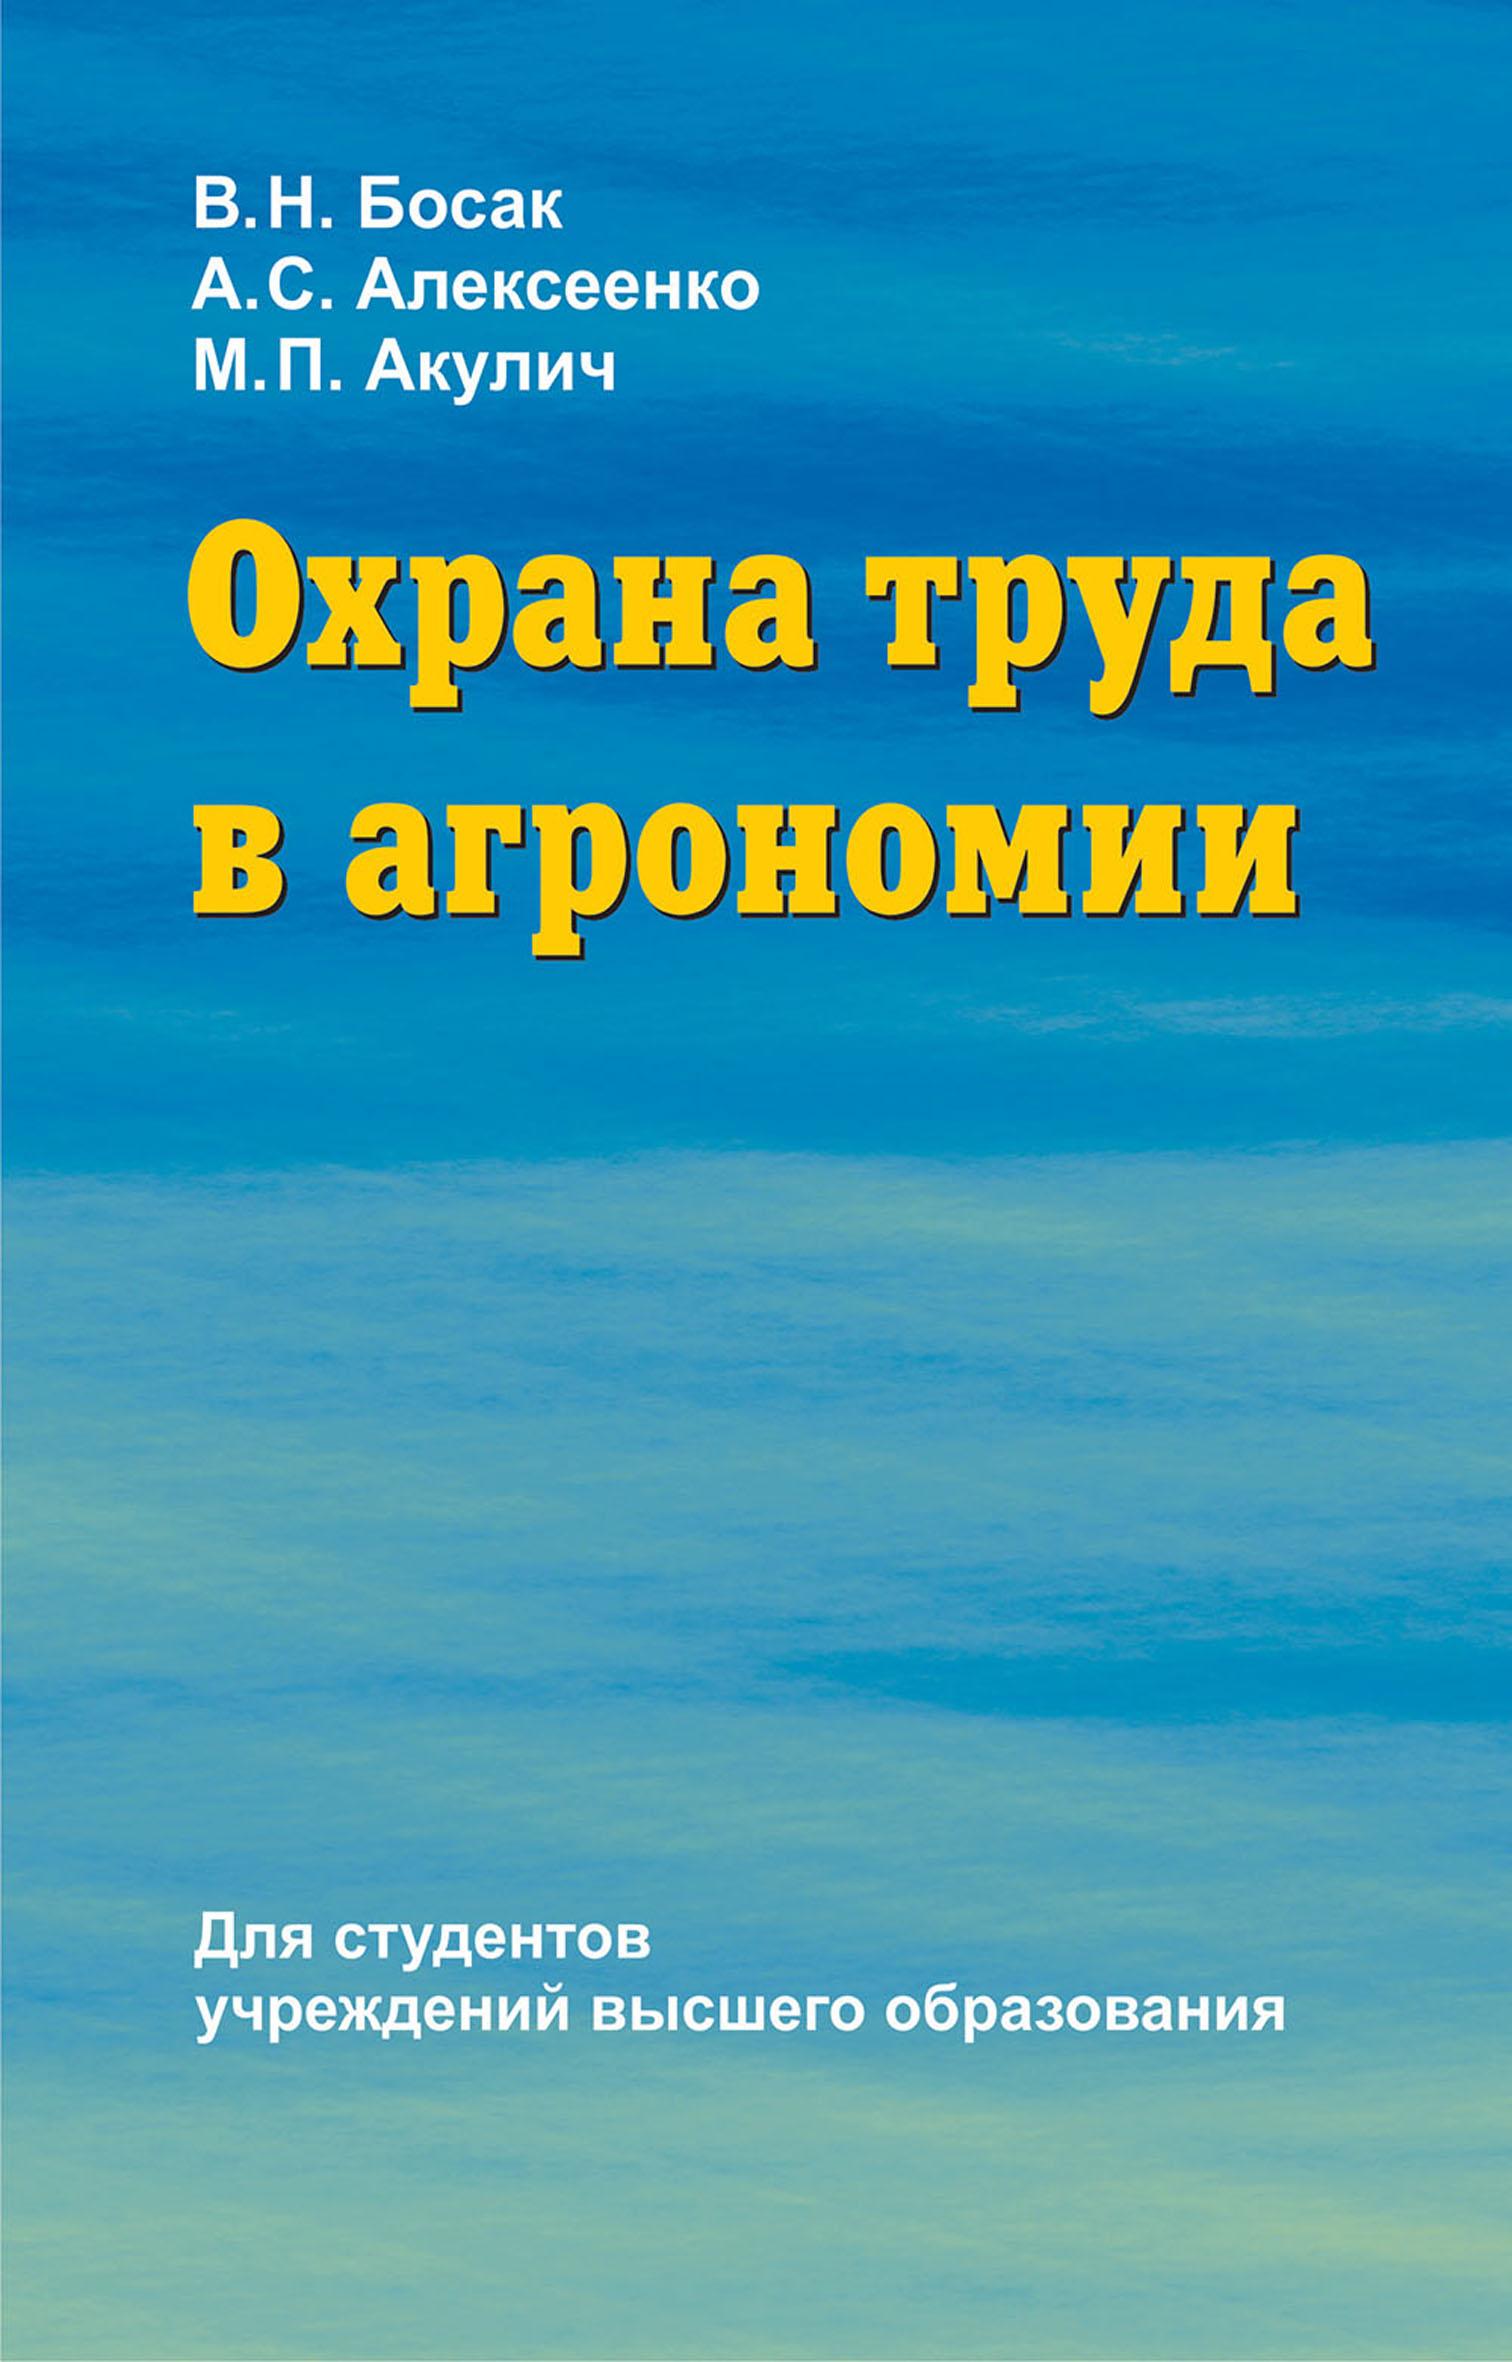 Охрана труда в агрономии ( В. Н. Босак  )